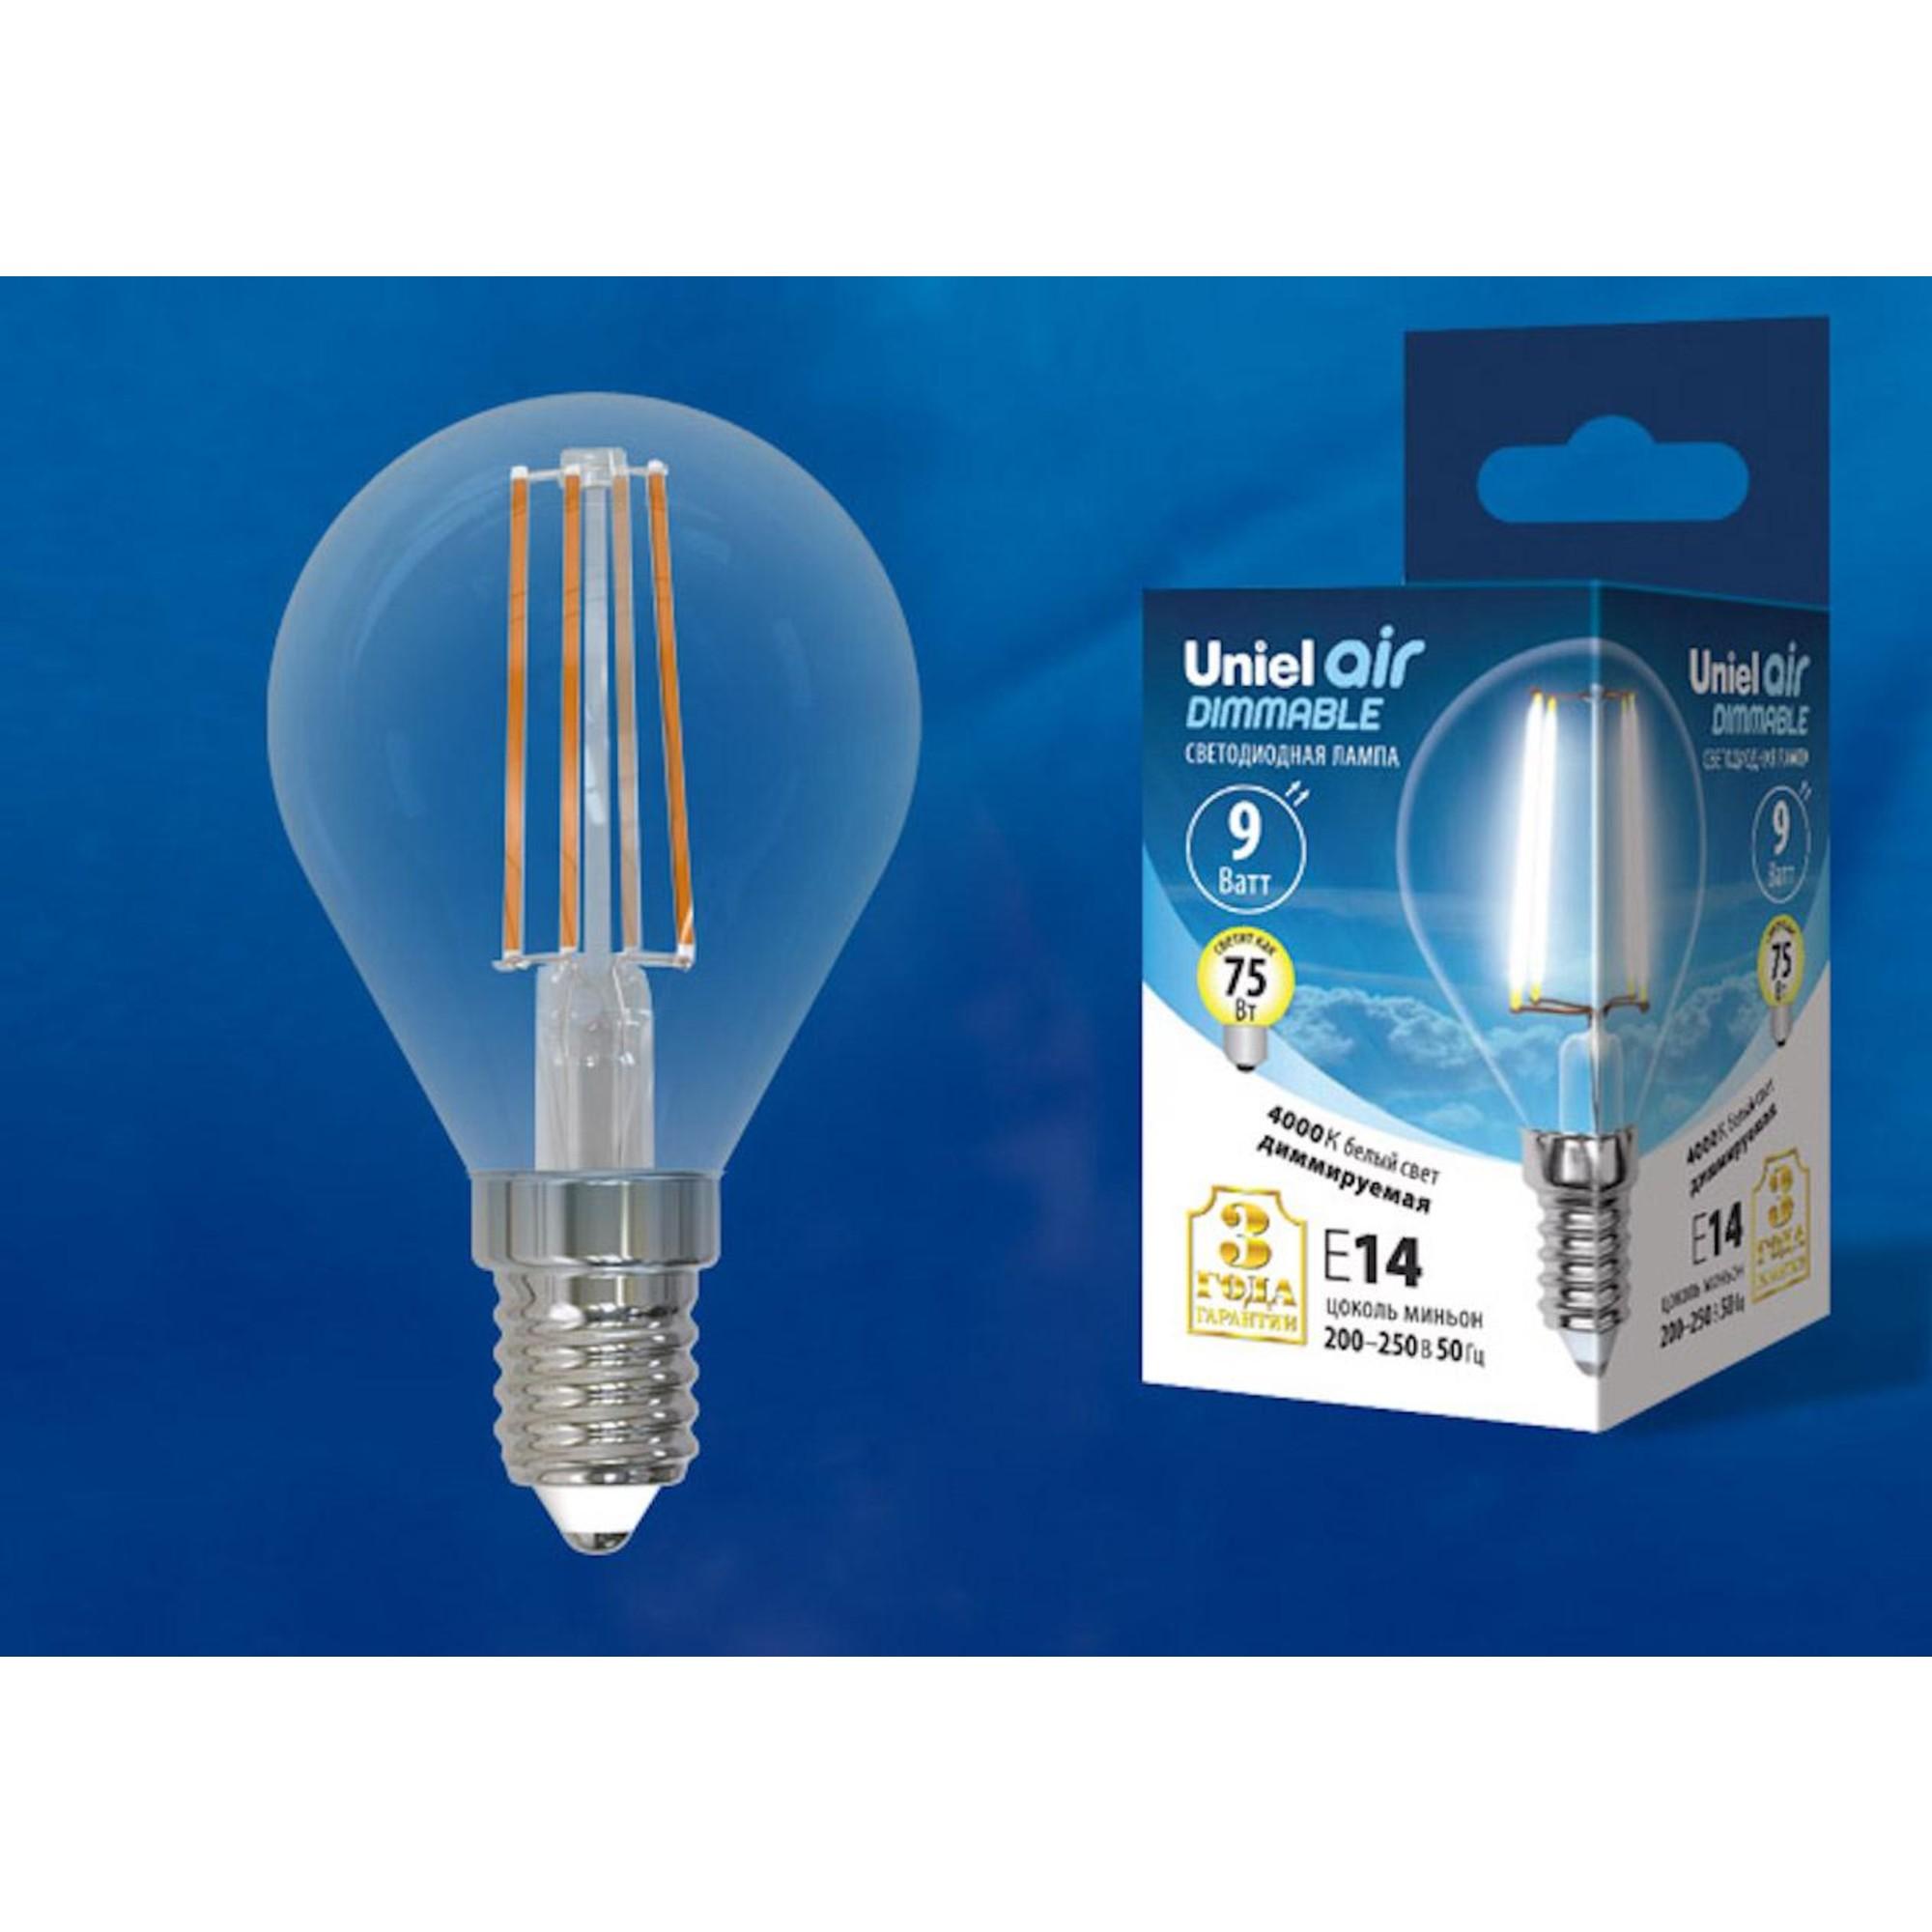 Светодиодная лампочка Uniel LED-G45-9W AIR DIMMABLE UL-00005192